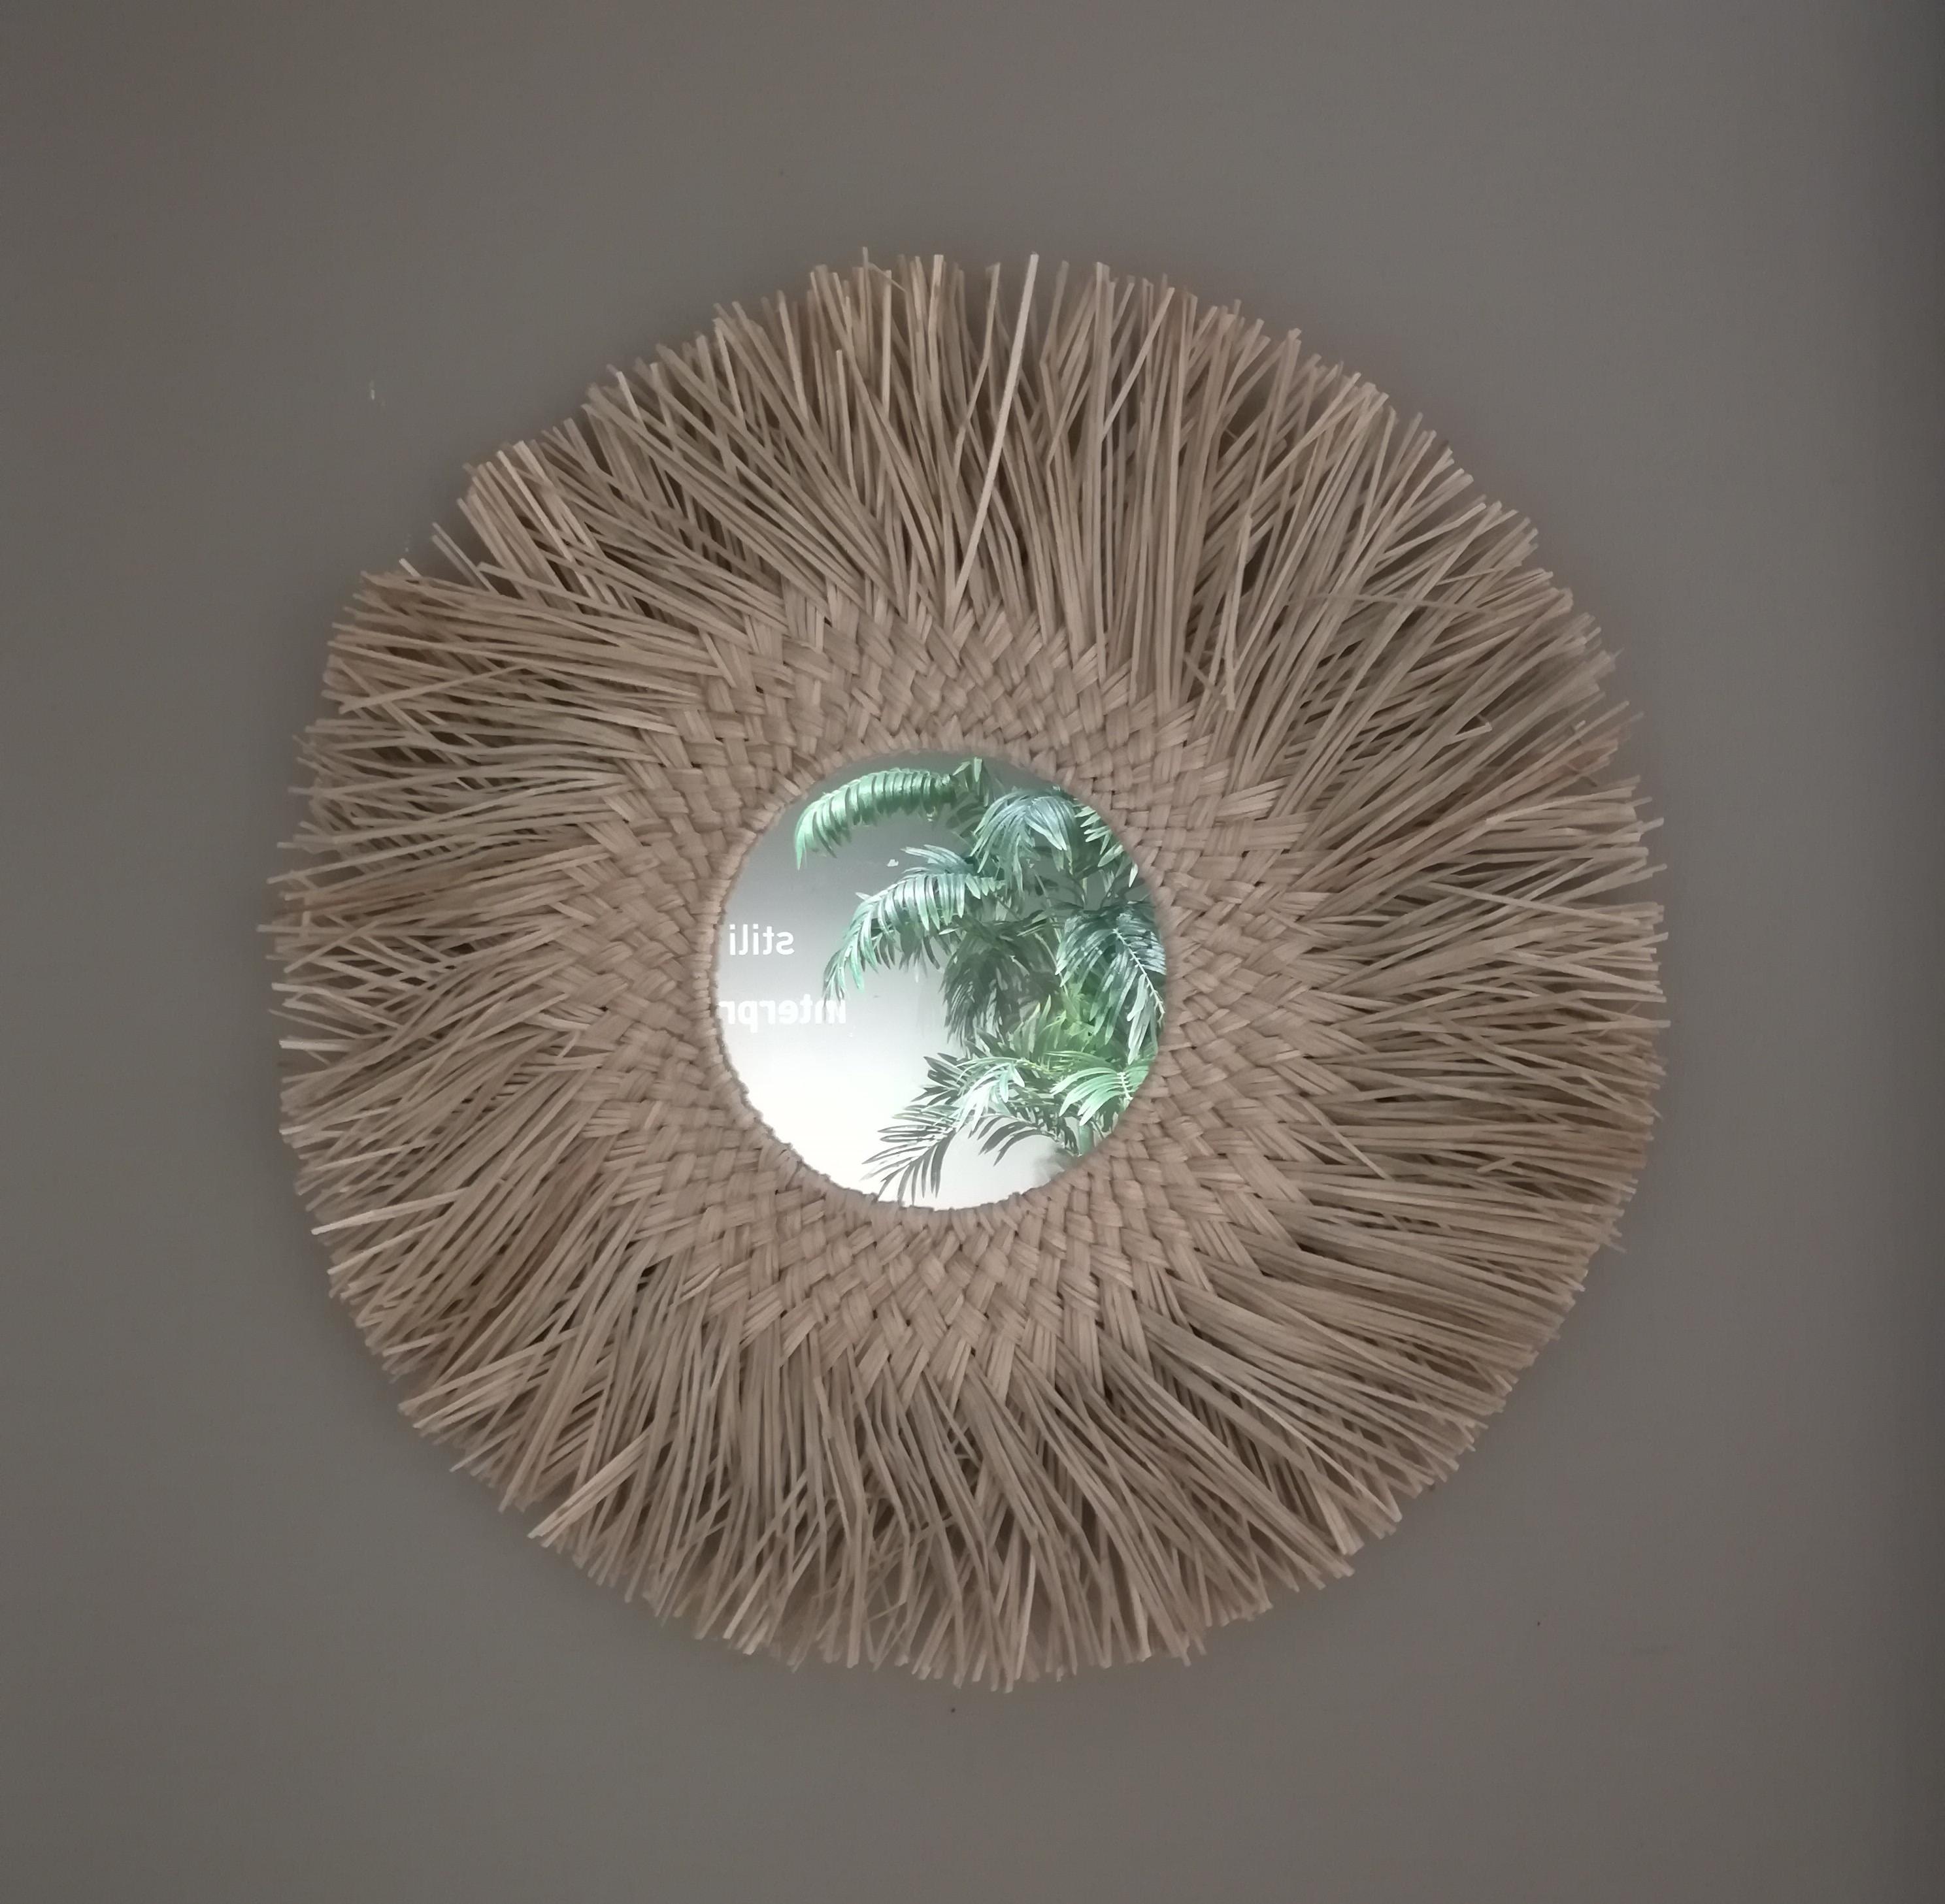 Specchio cornice foglie di palma, Trasparente, large image number 0